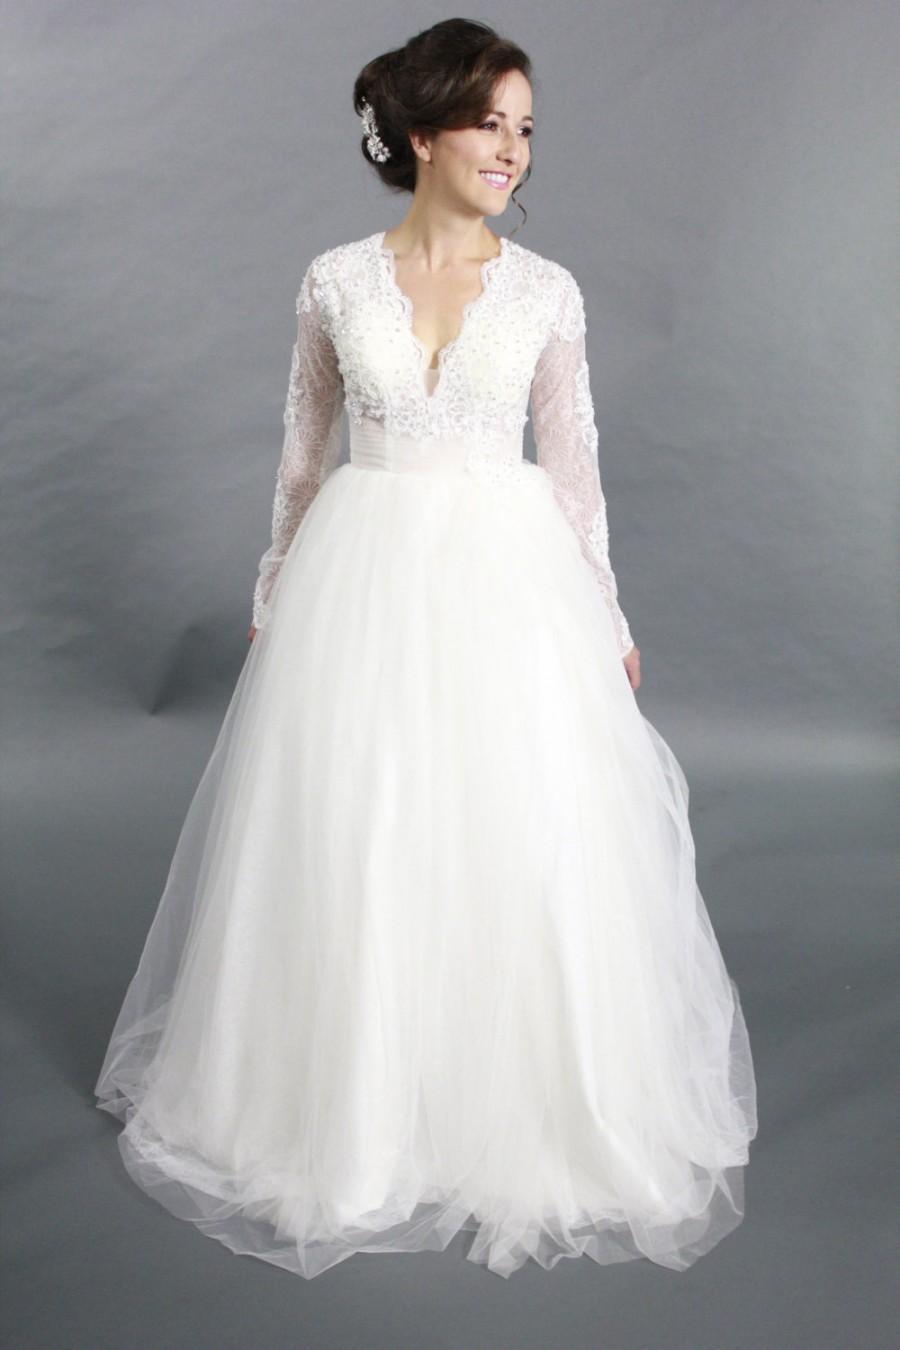 Wedding - Long Sleeves Lace Applique Ballgown V neck wedding dress